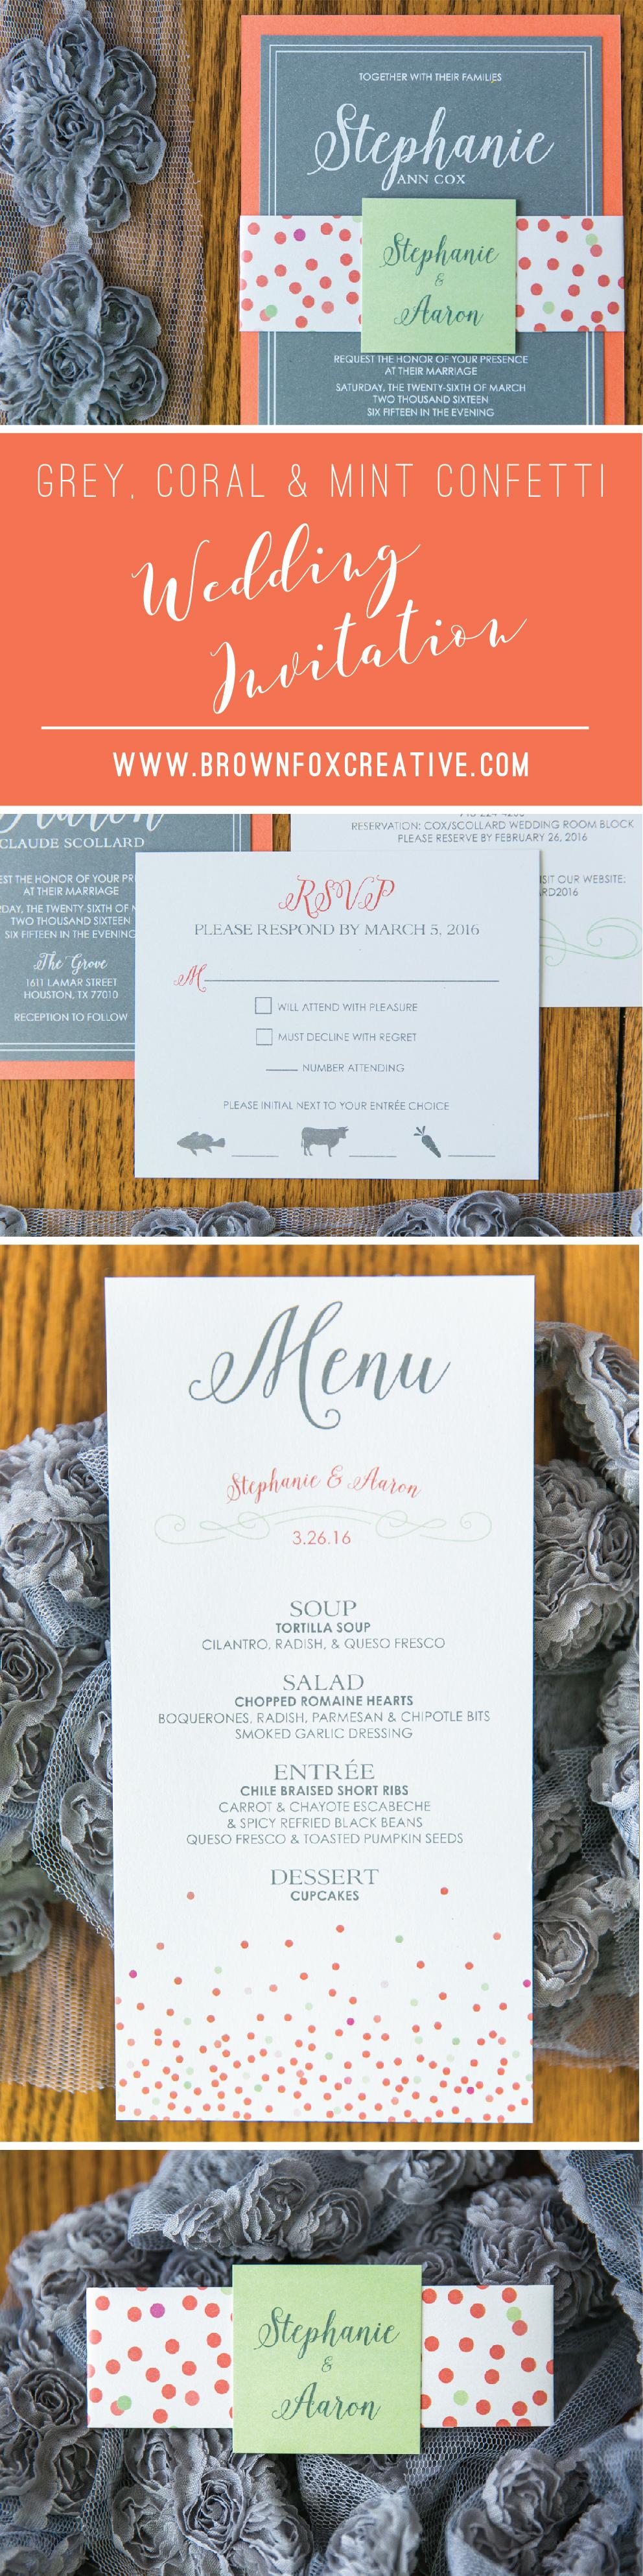 Coral Mint Grey Confetti Dots Fun Playful Layered Wedding